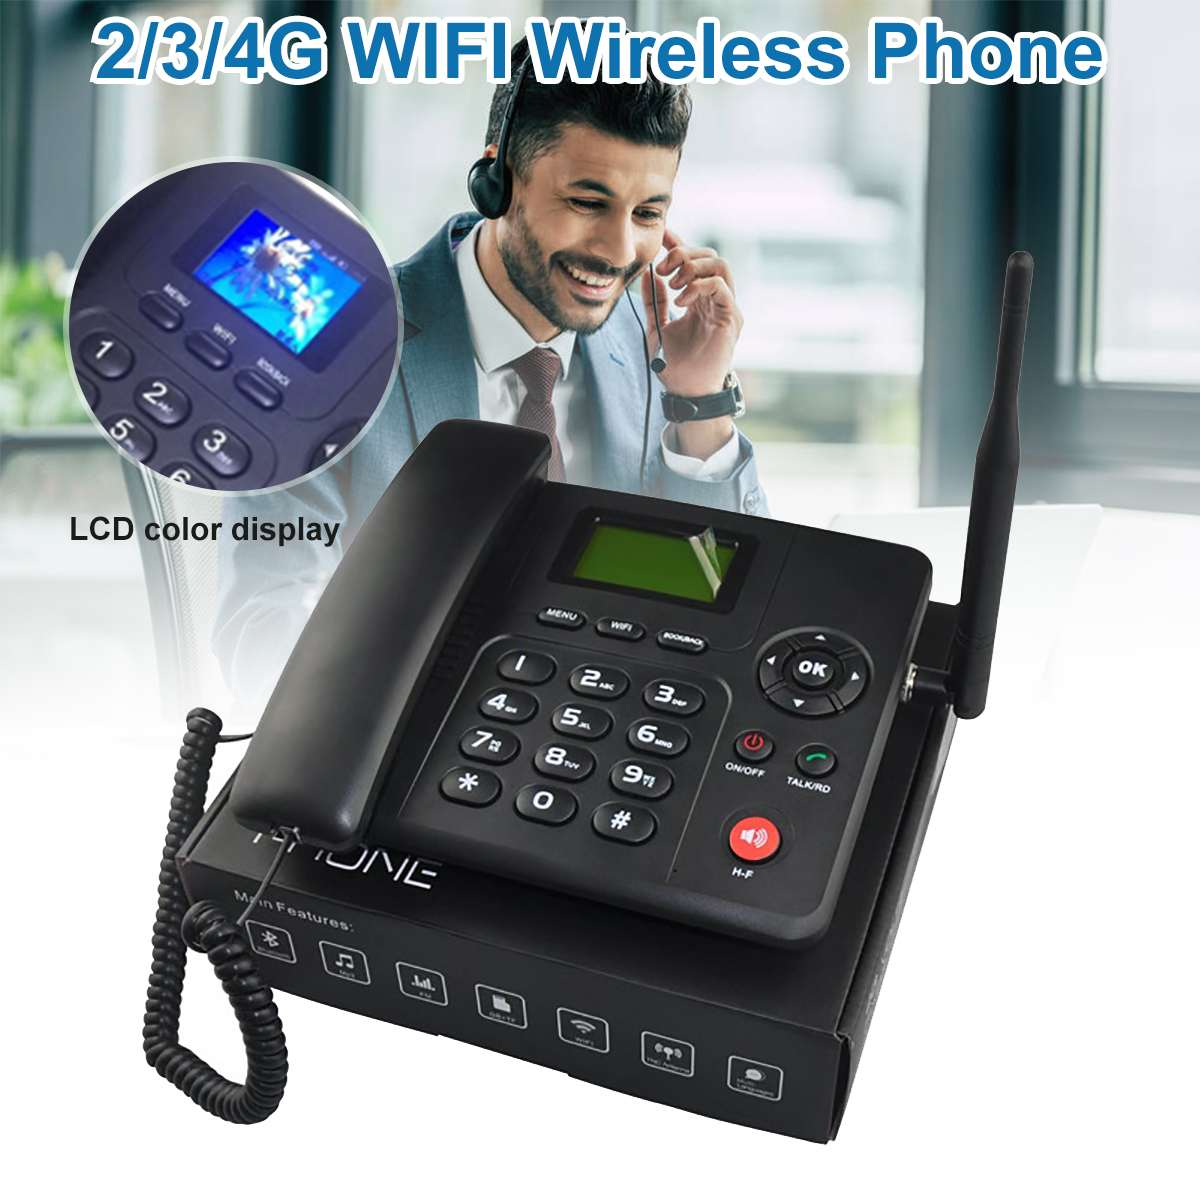 4G WIFI Wireless Fixed Phone Desktop Telephone GSM SIM Card LCD For Office Home Call Center Company Hotel EU/US/UK/AU Plug